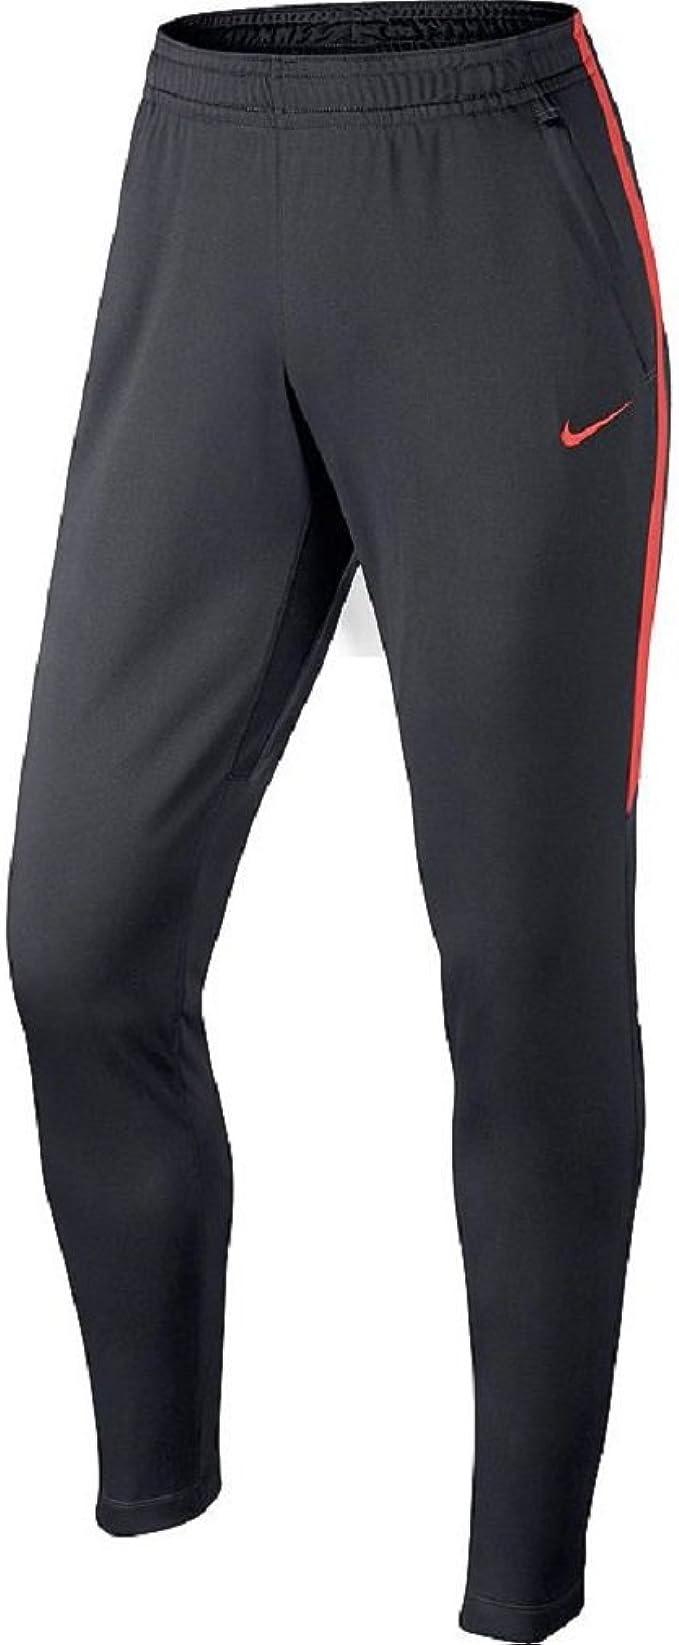 Amazon.com : Women's Nike Academy Dri-FIT Knit Soccer Pants ...